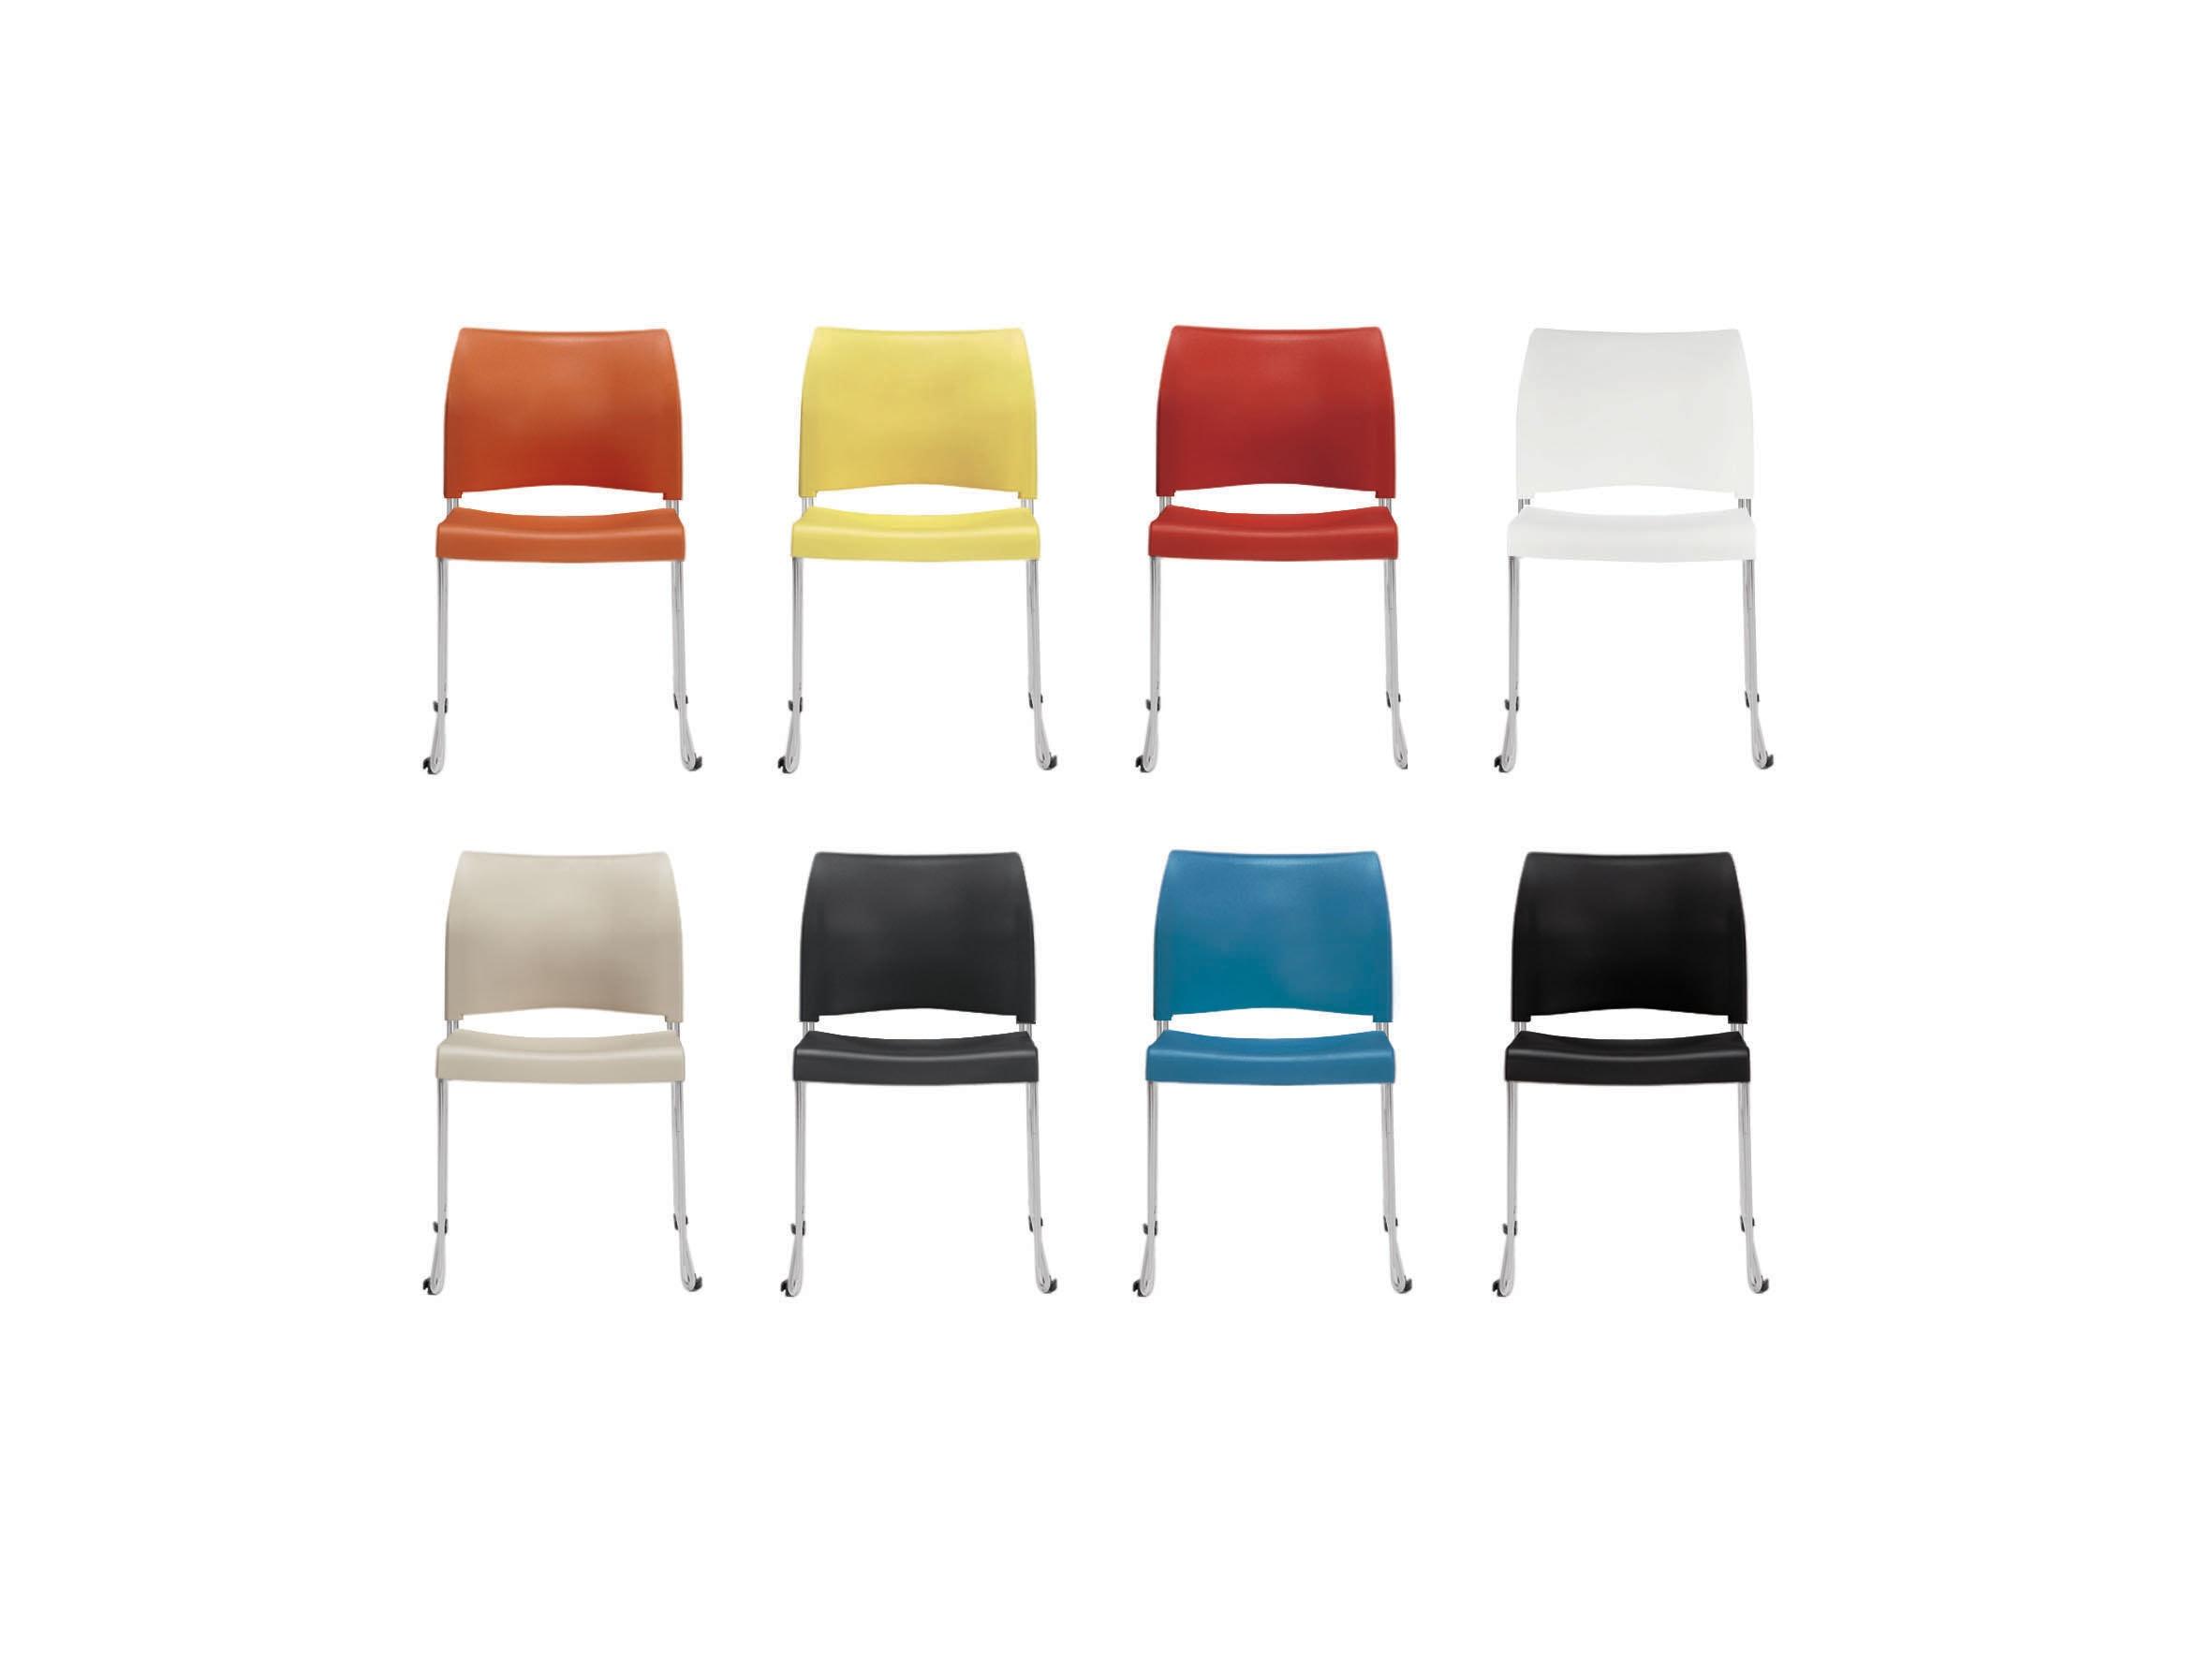 Stax Color Group v2